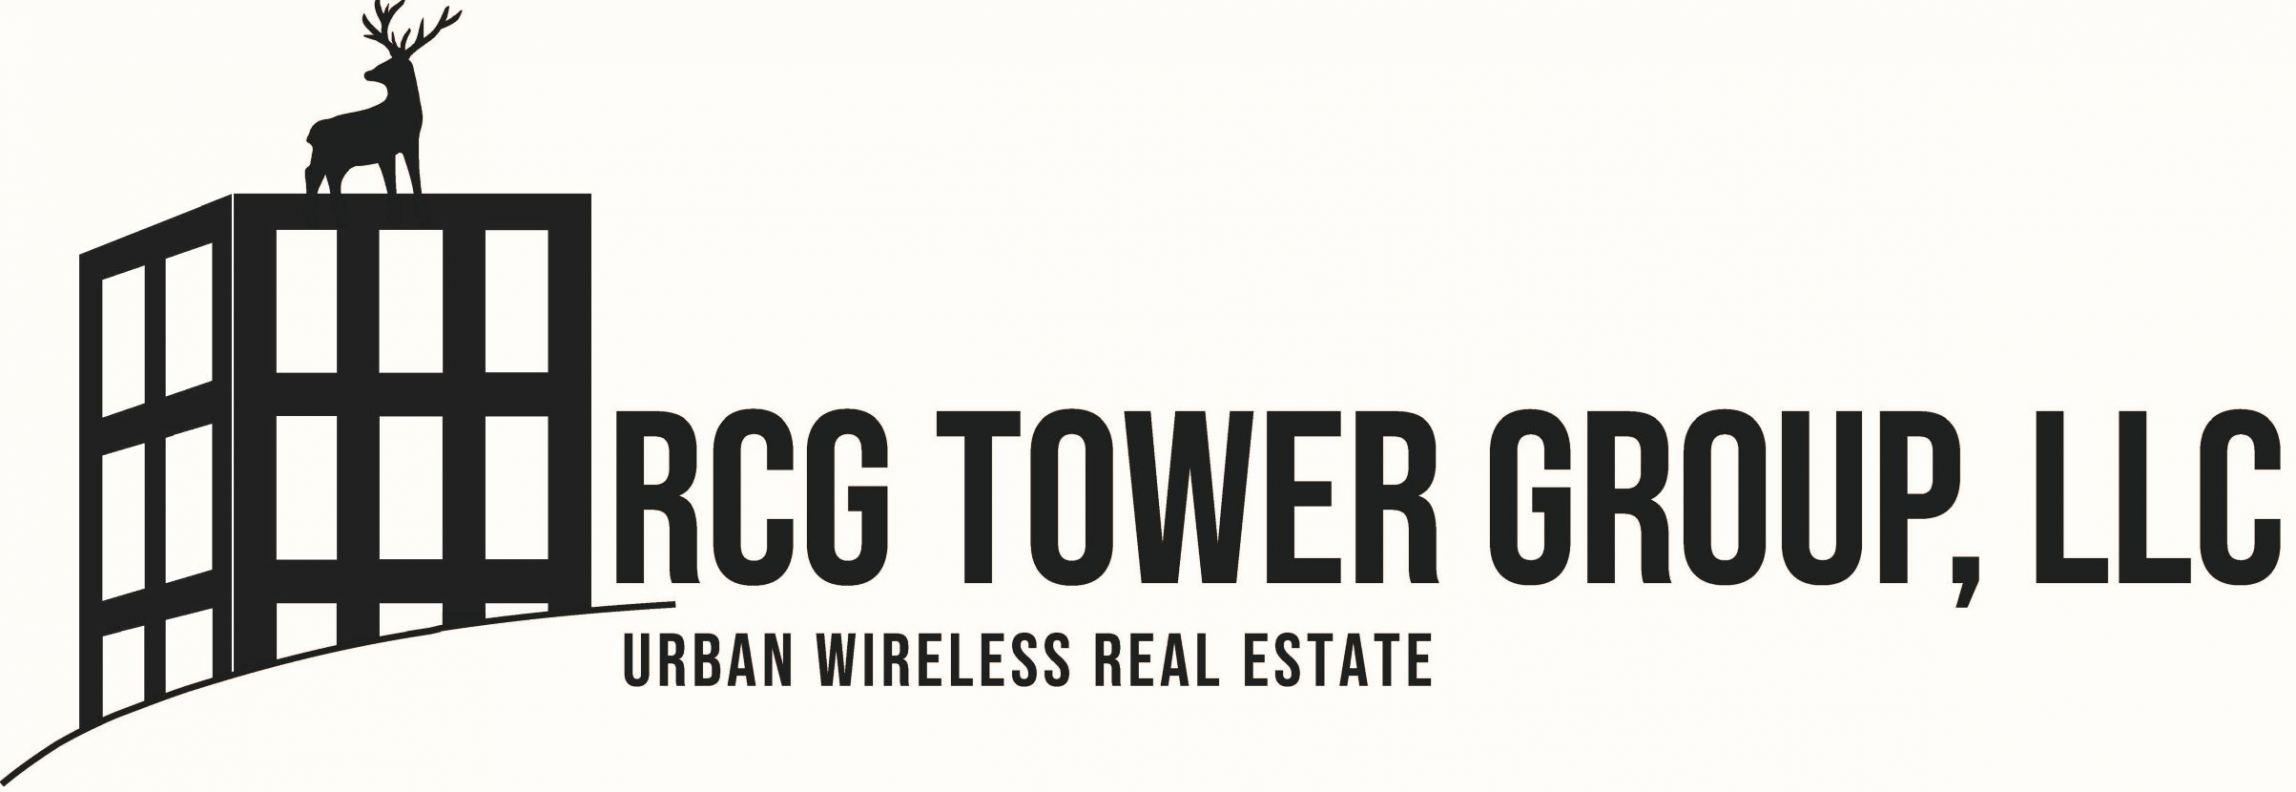 RCG Tower Group, LLC Logo